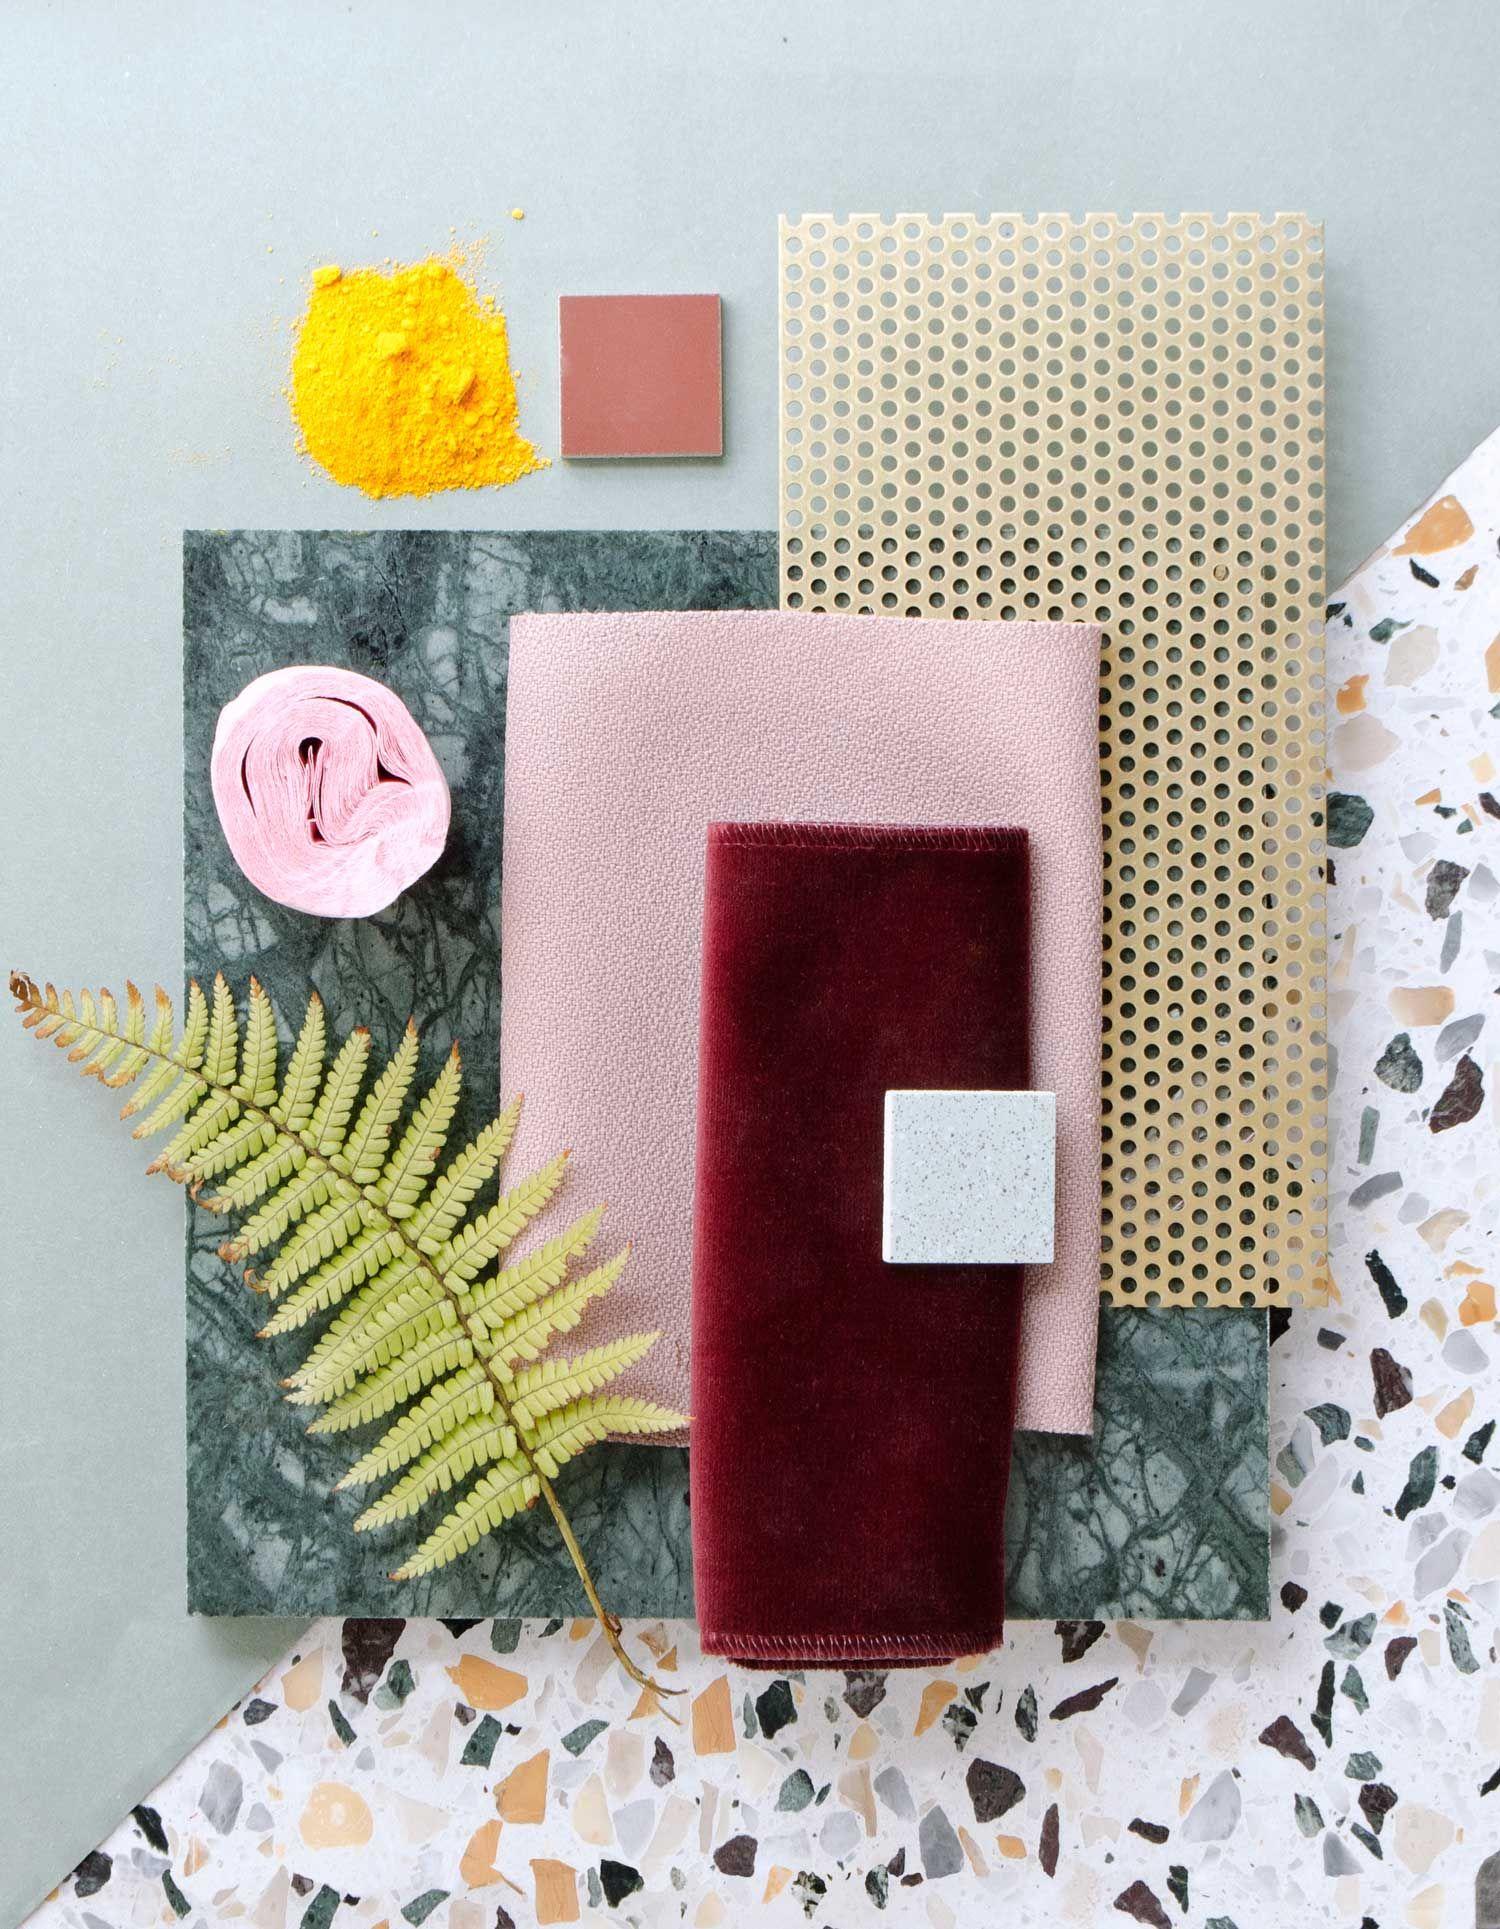 Materials by Studio David Thulstrup | http://www.yellowtrace.com.au/david-thulstrup-interview/